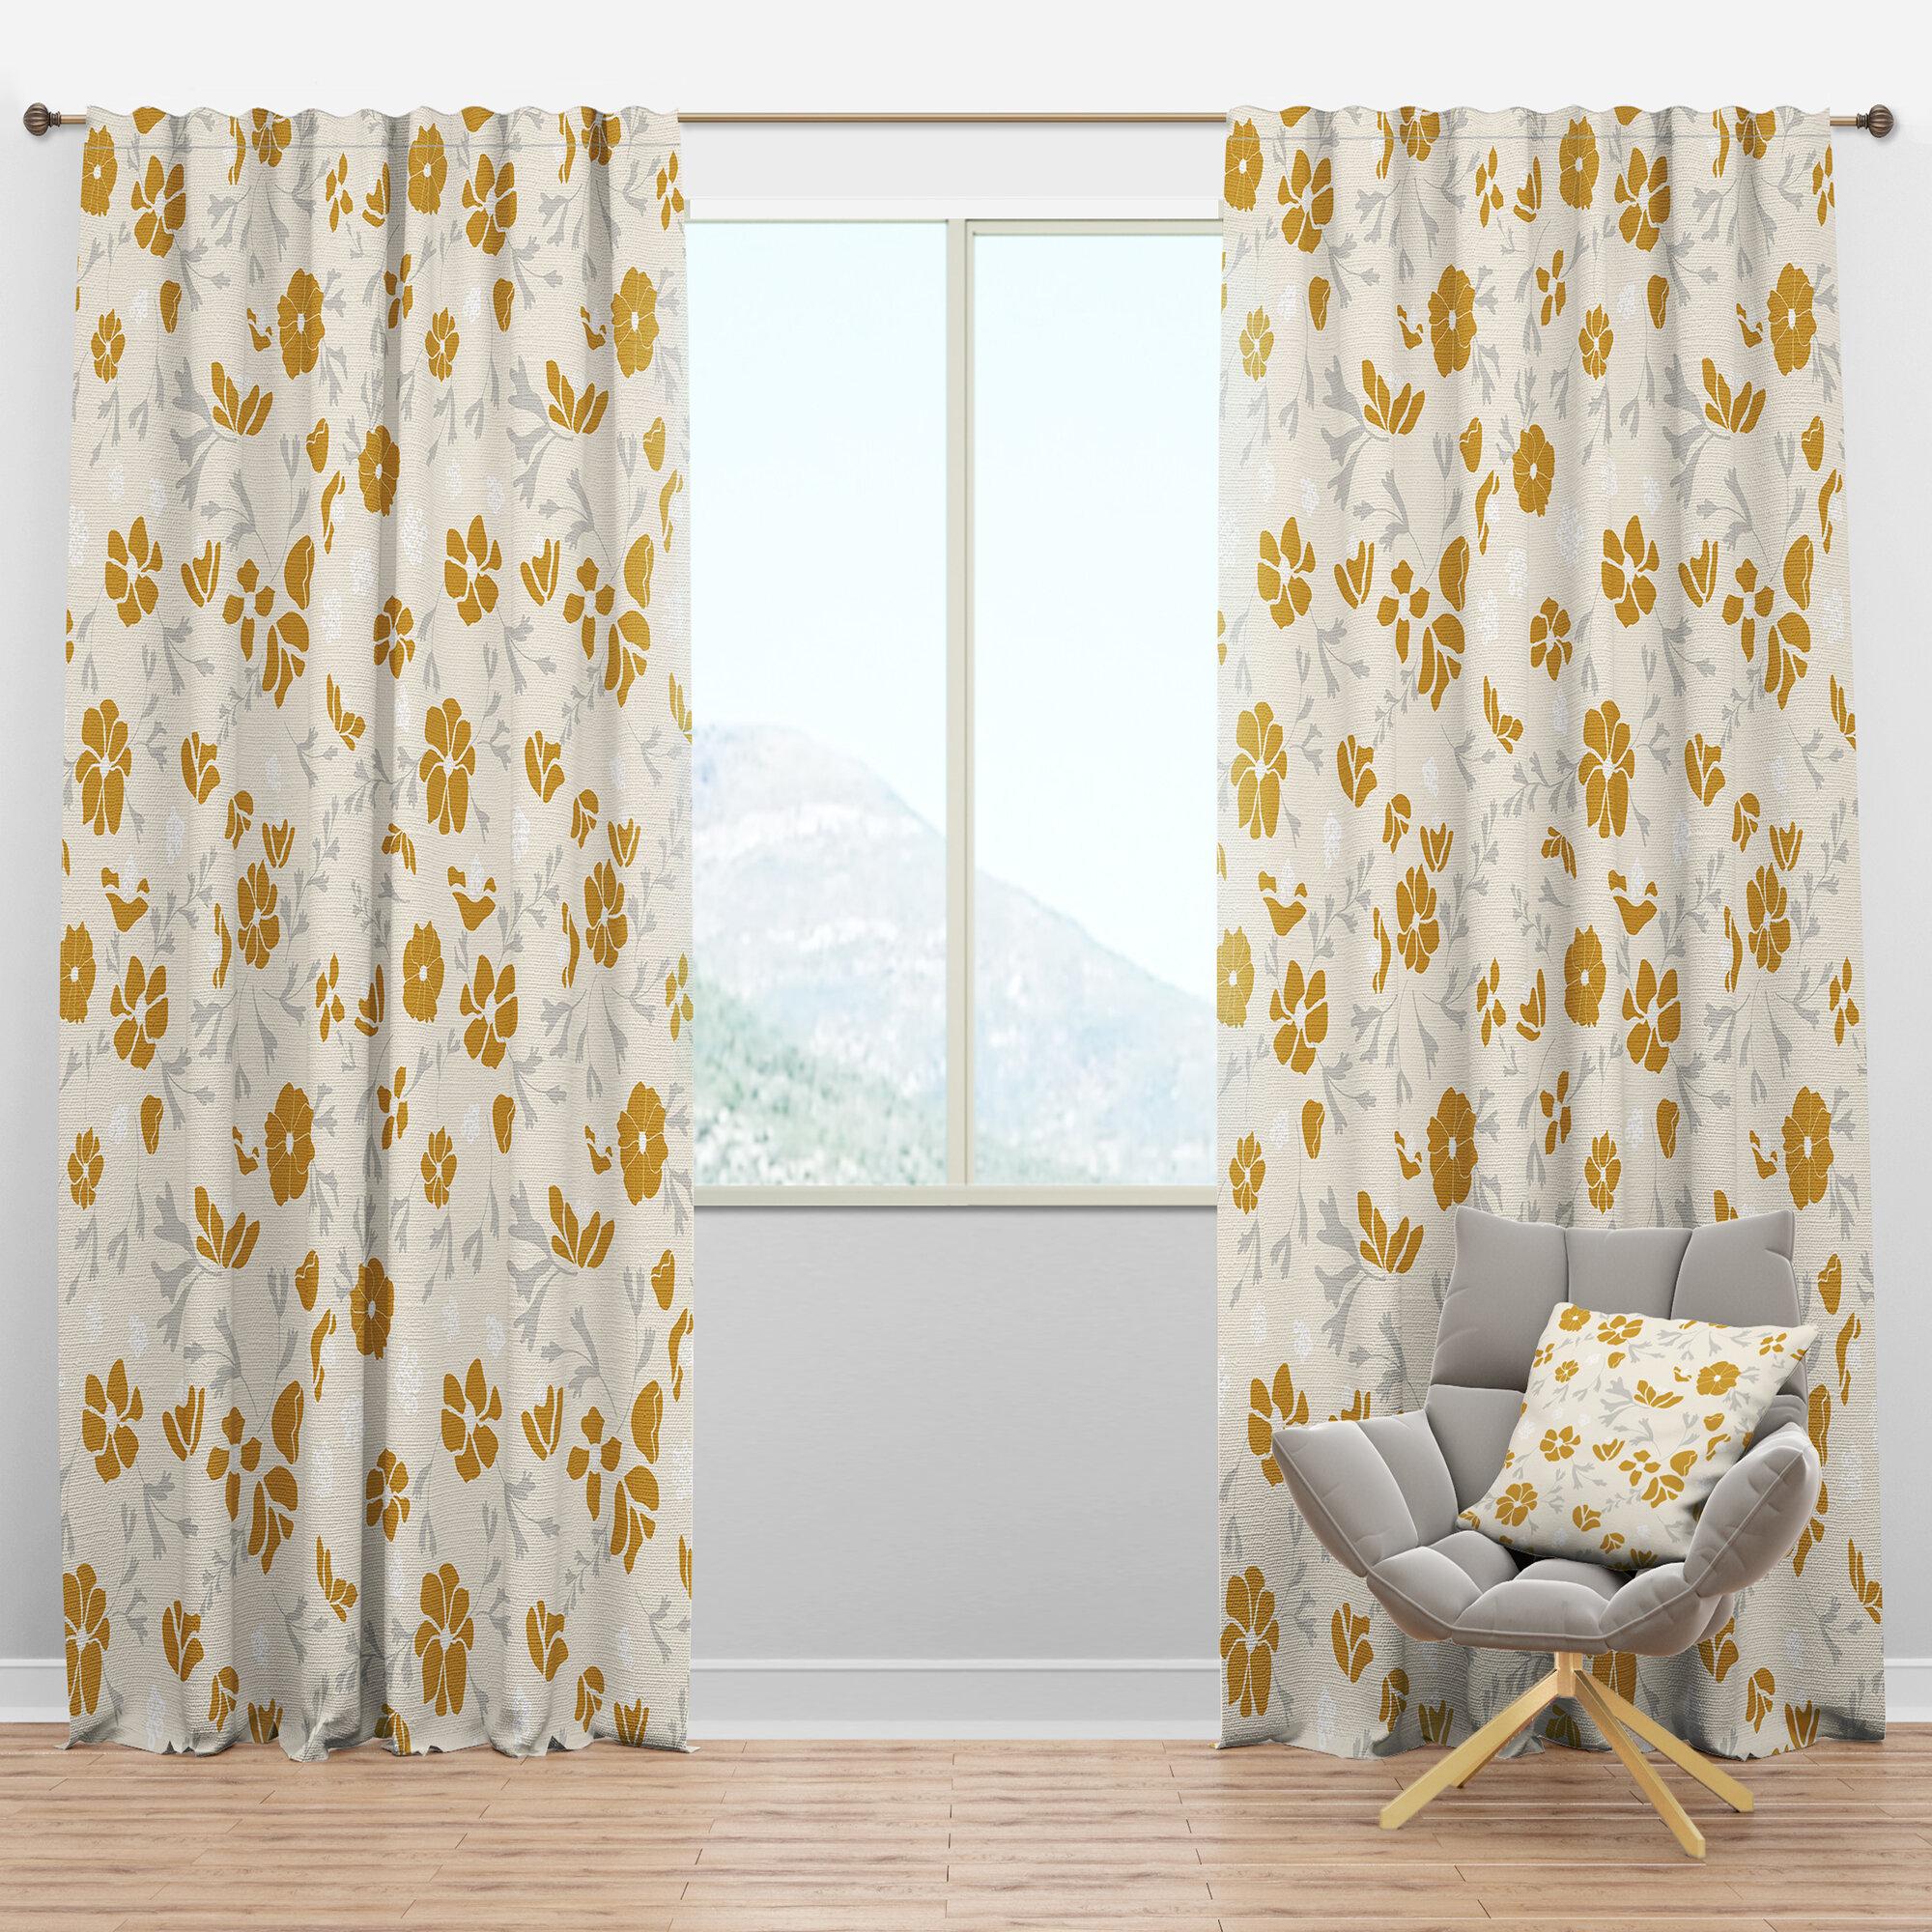 Designart Mid Century Handdrawn Poppies Iii Floral Semi Sheer Thermal Rod Pocket Curtain Panels Wayfair